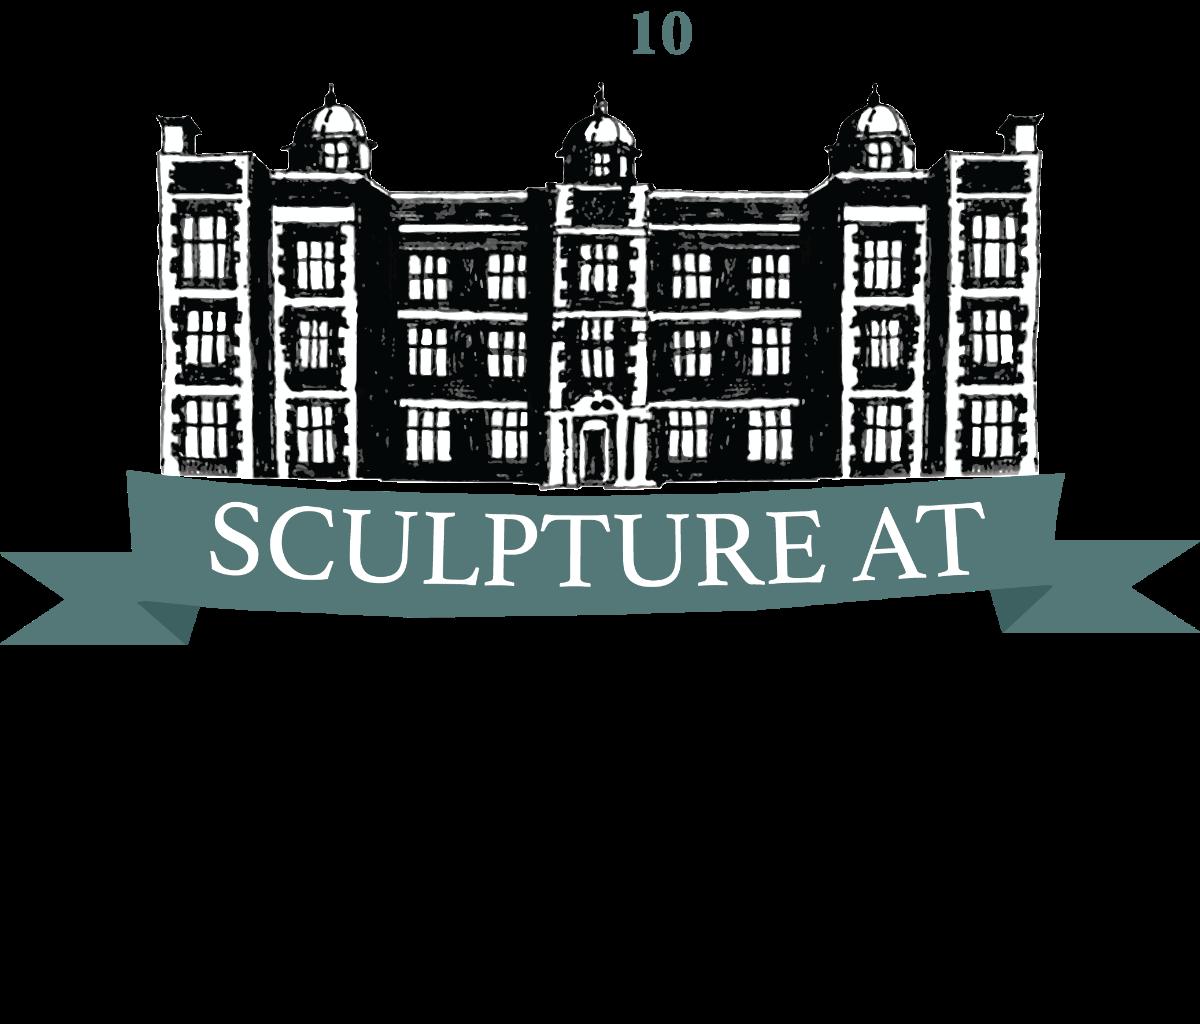 Sculpture at Doddington Hall